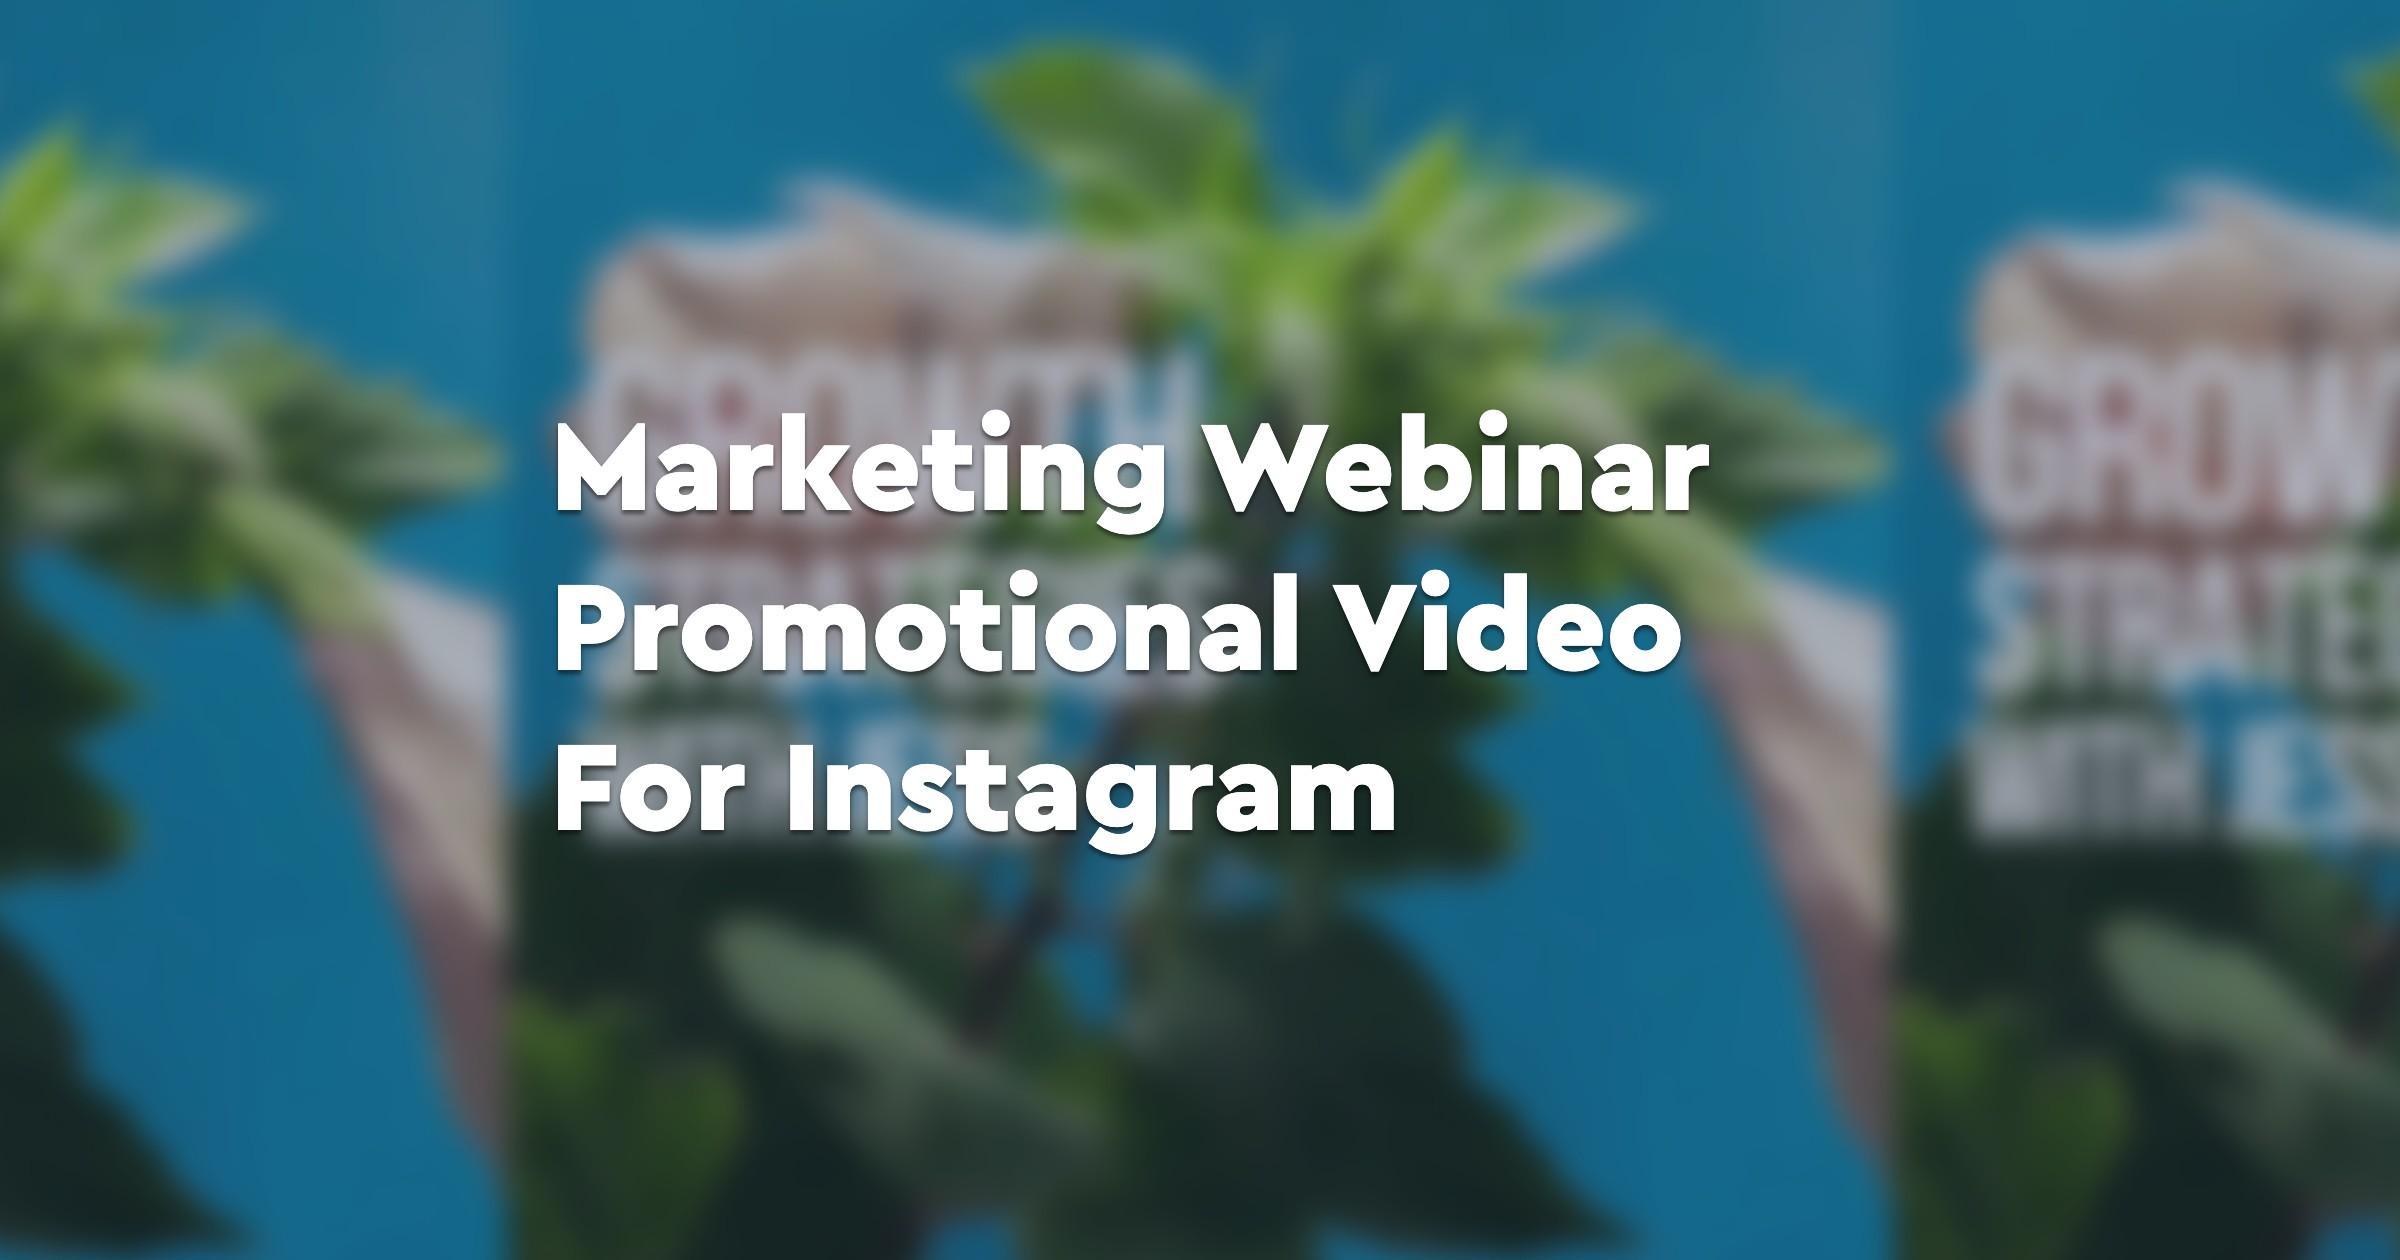 Marketing Webinar Promotional Video For Instagram